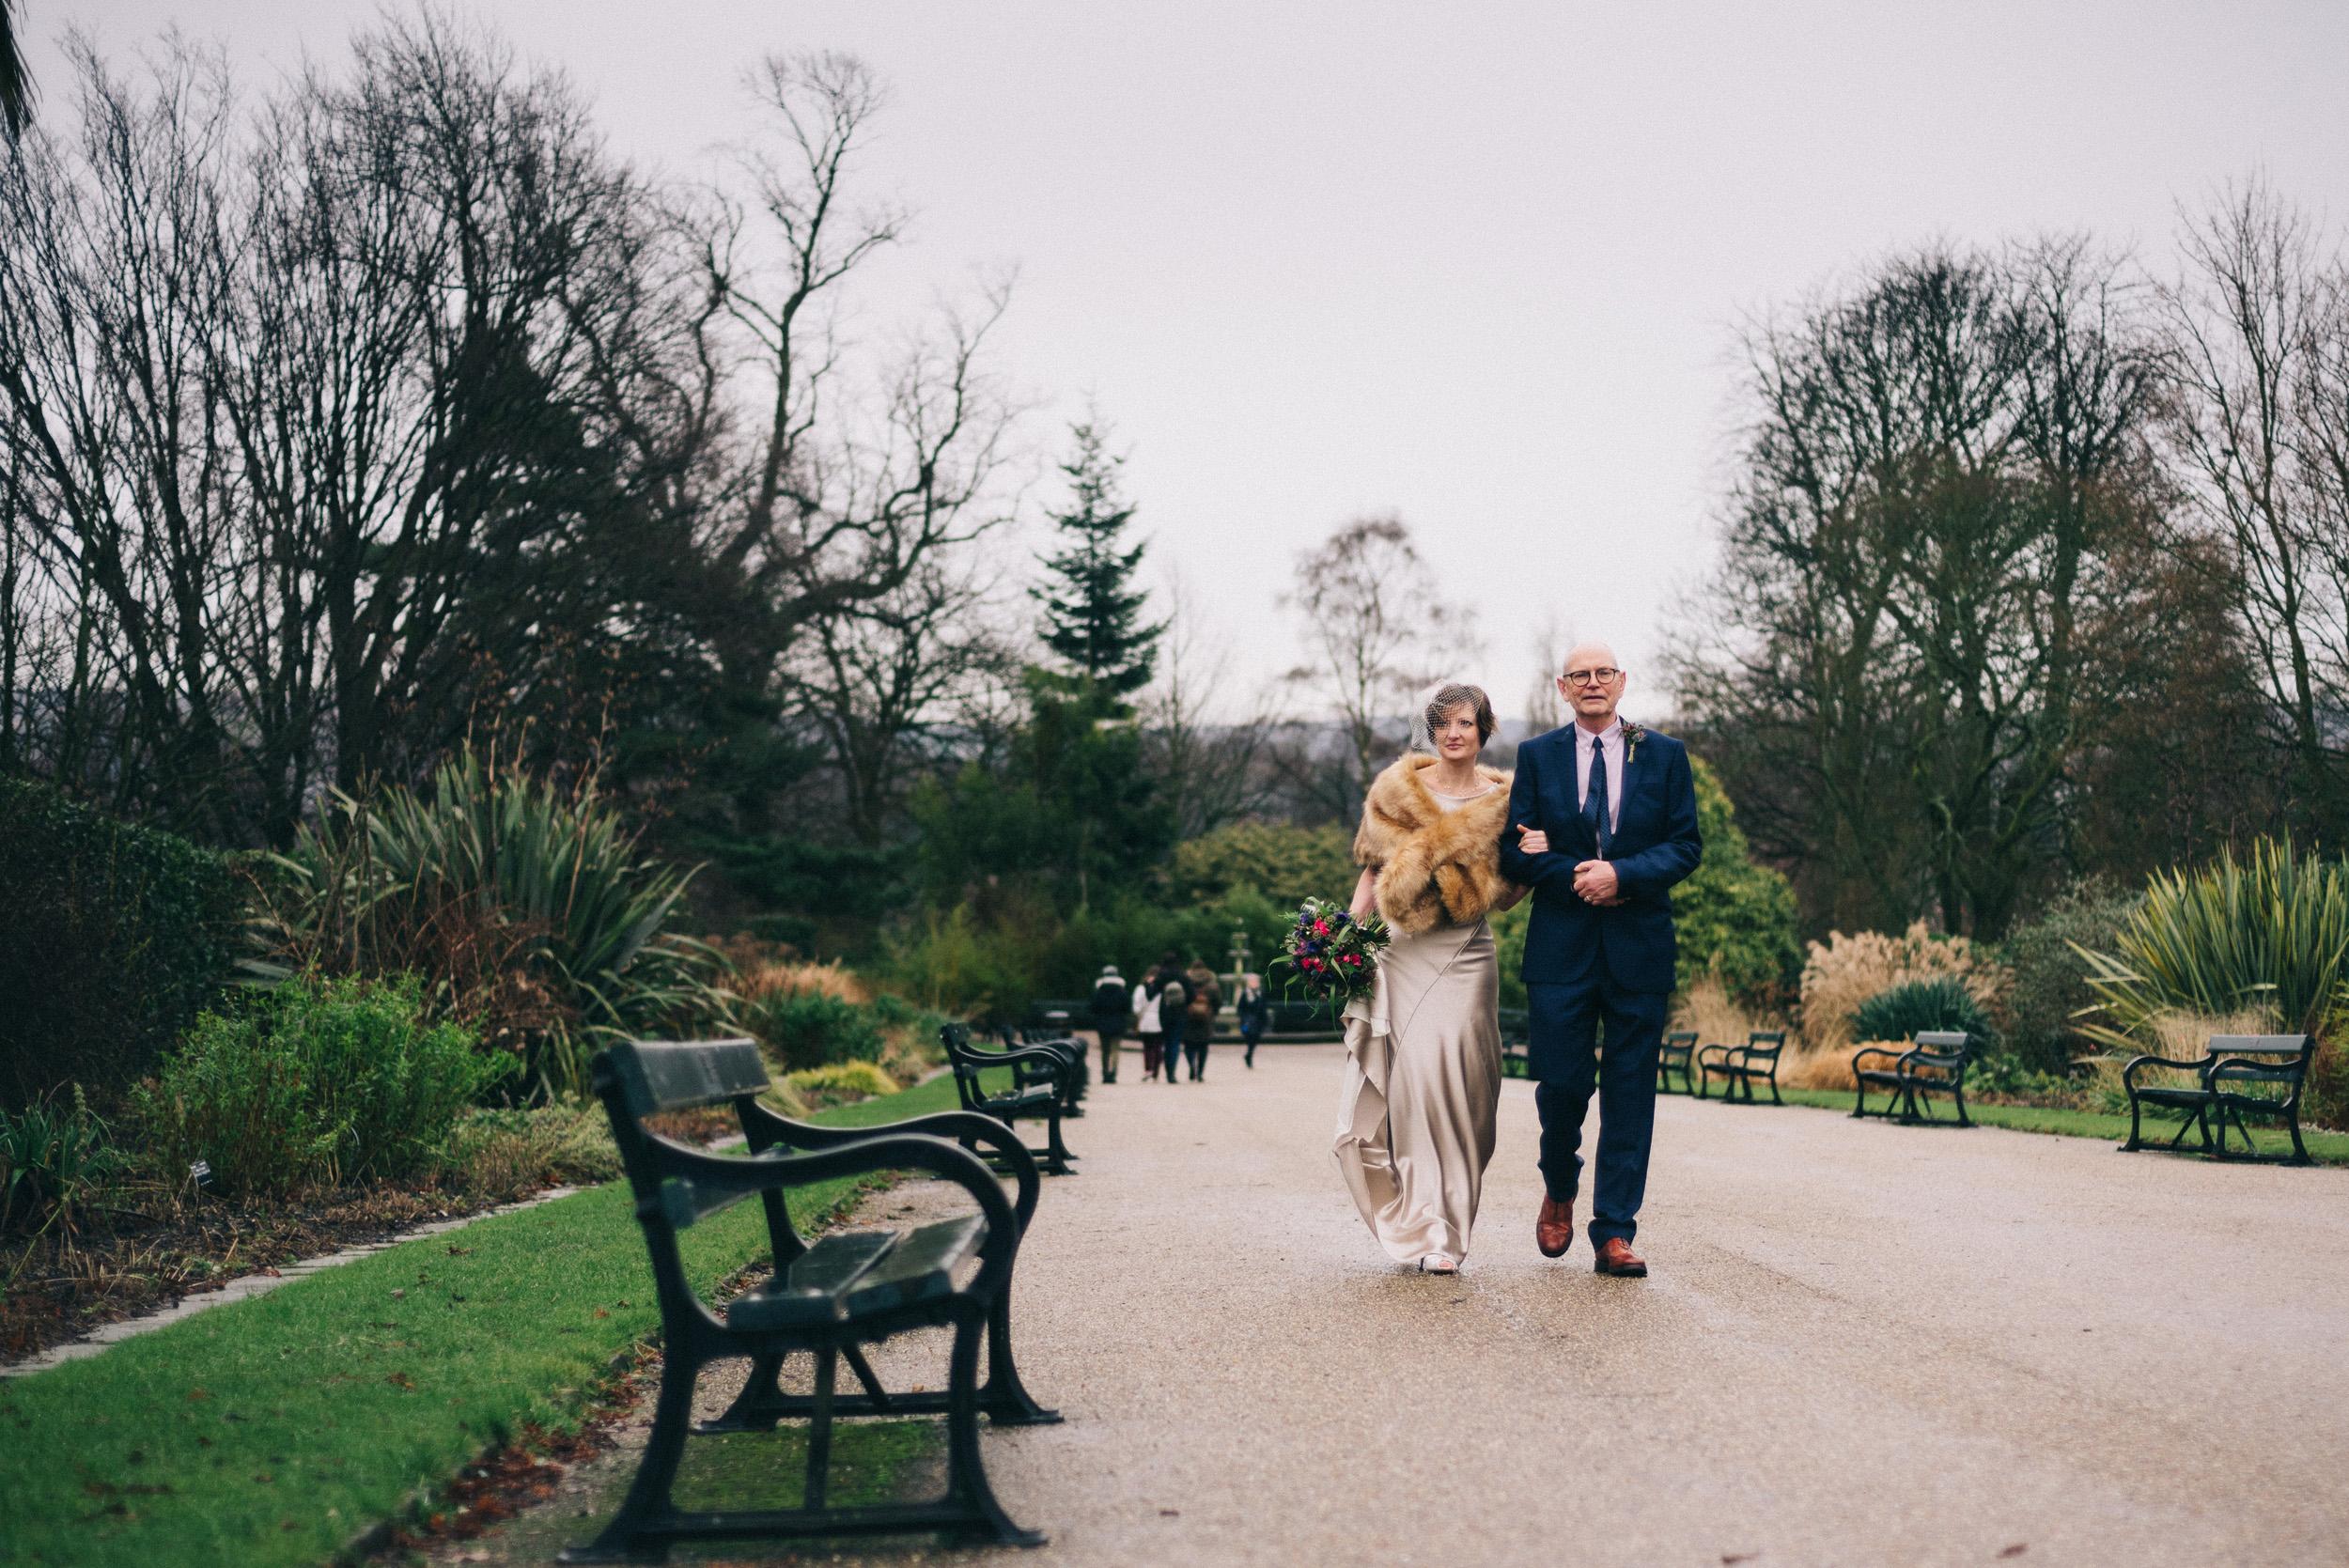 Alice-Bias-Cut-Silk-Wedding-Dress-Kate-Beaumont-Sheffield-Botanical-Gardens-by-Peakography-6.jpg